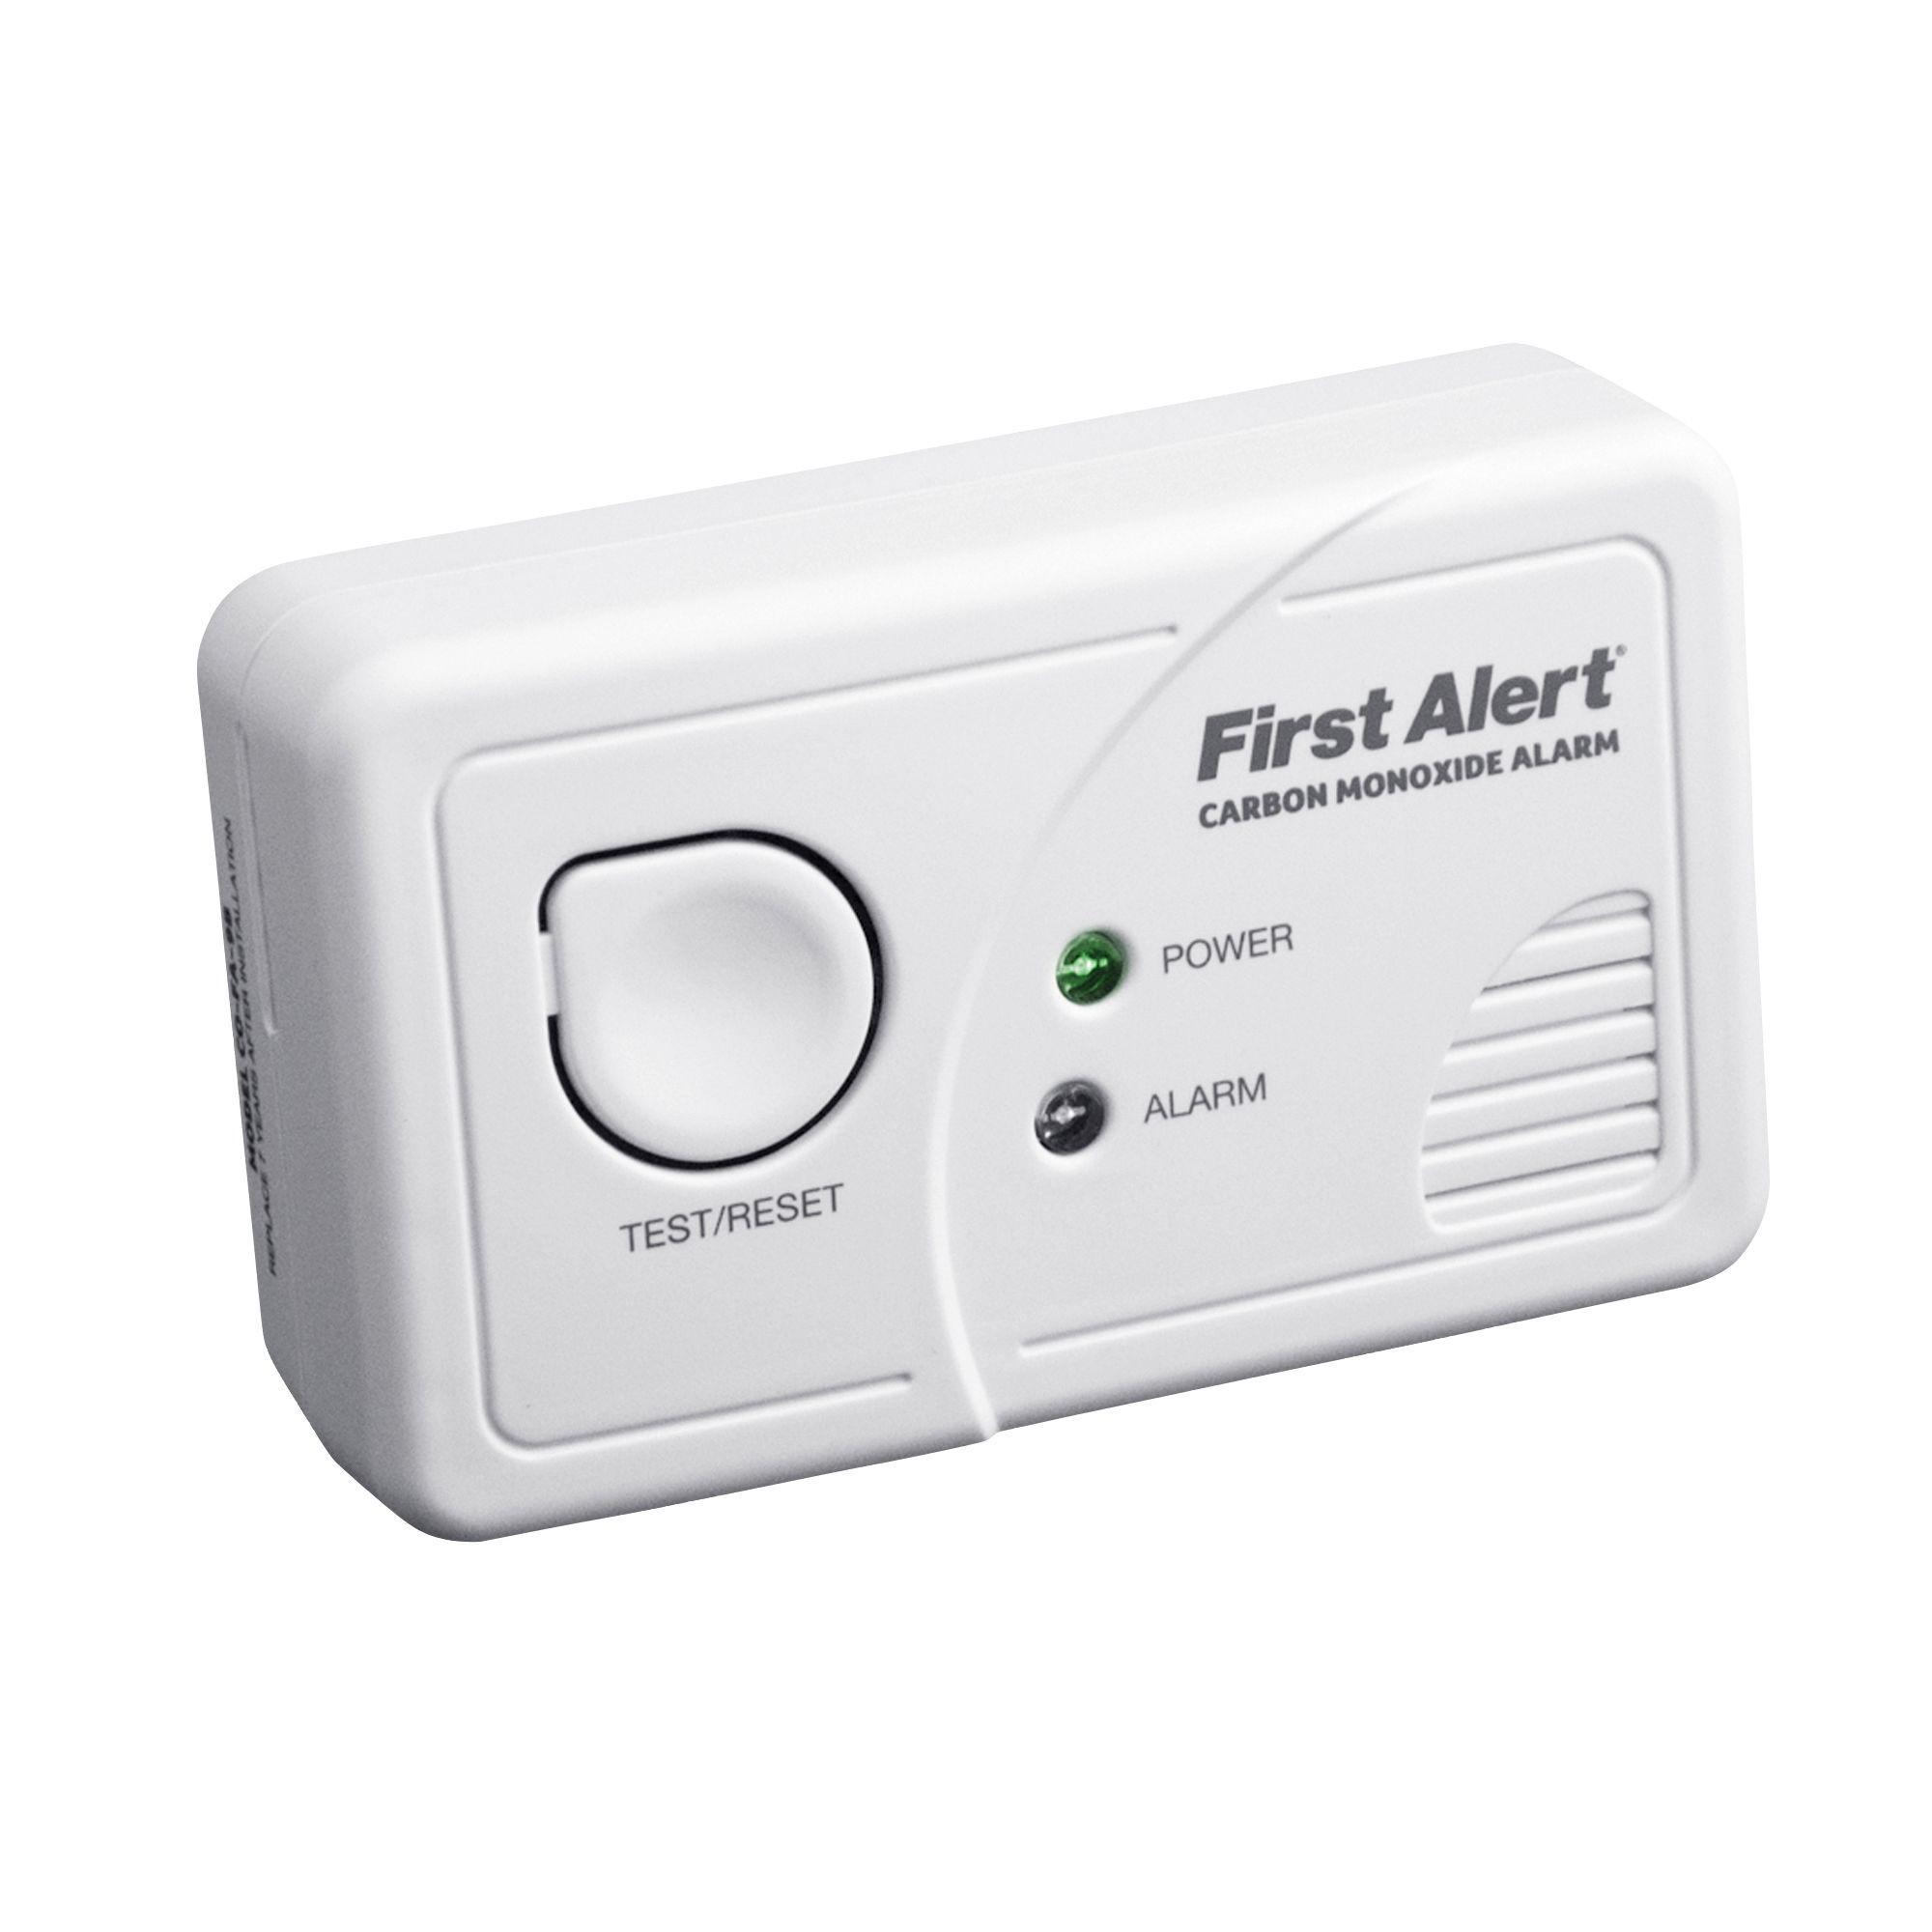 First alert led display co alarm departments diy at b q - Detector co2 domestico ...